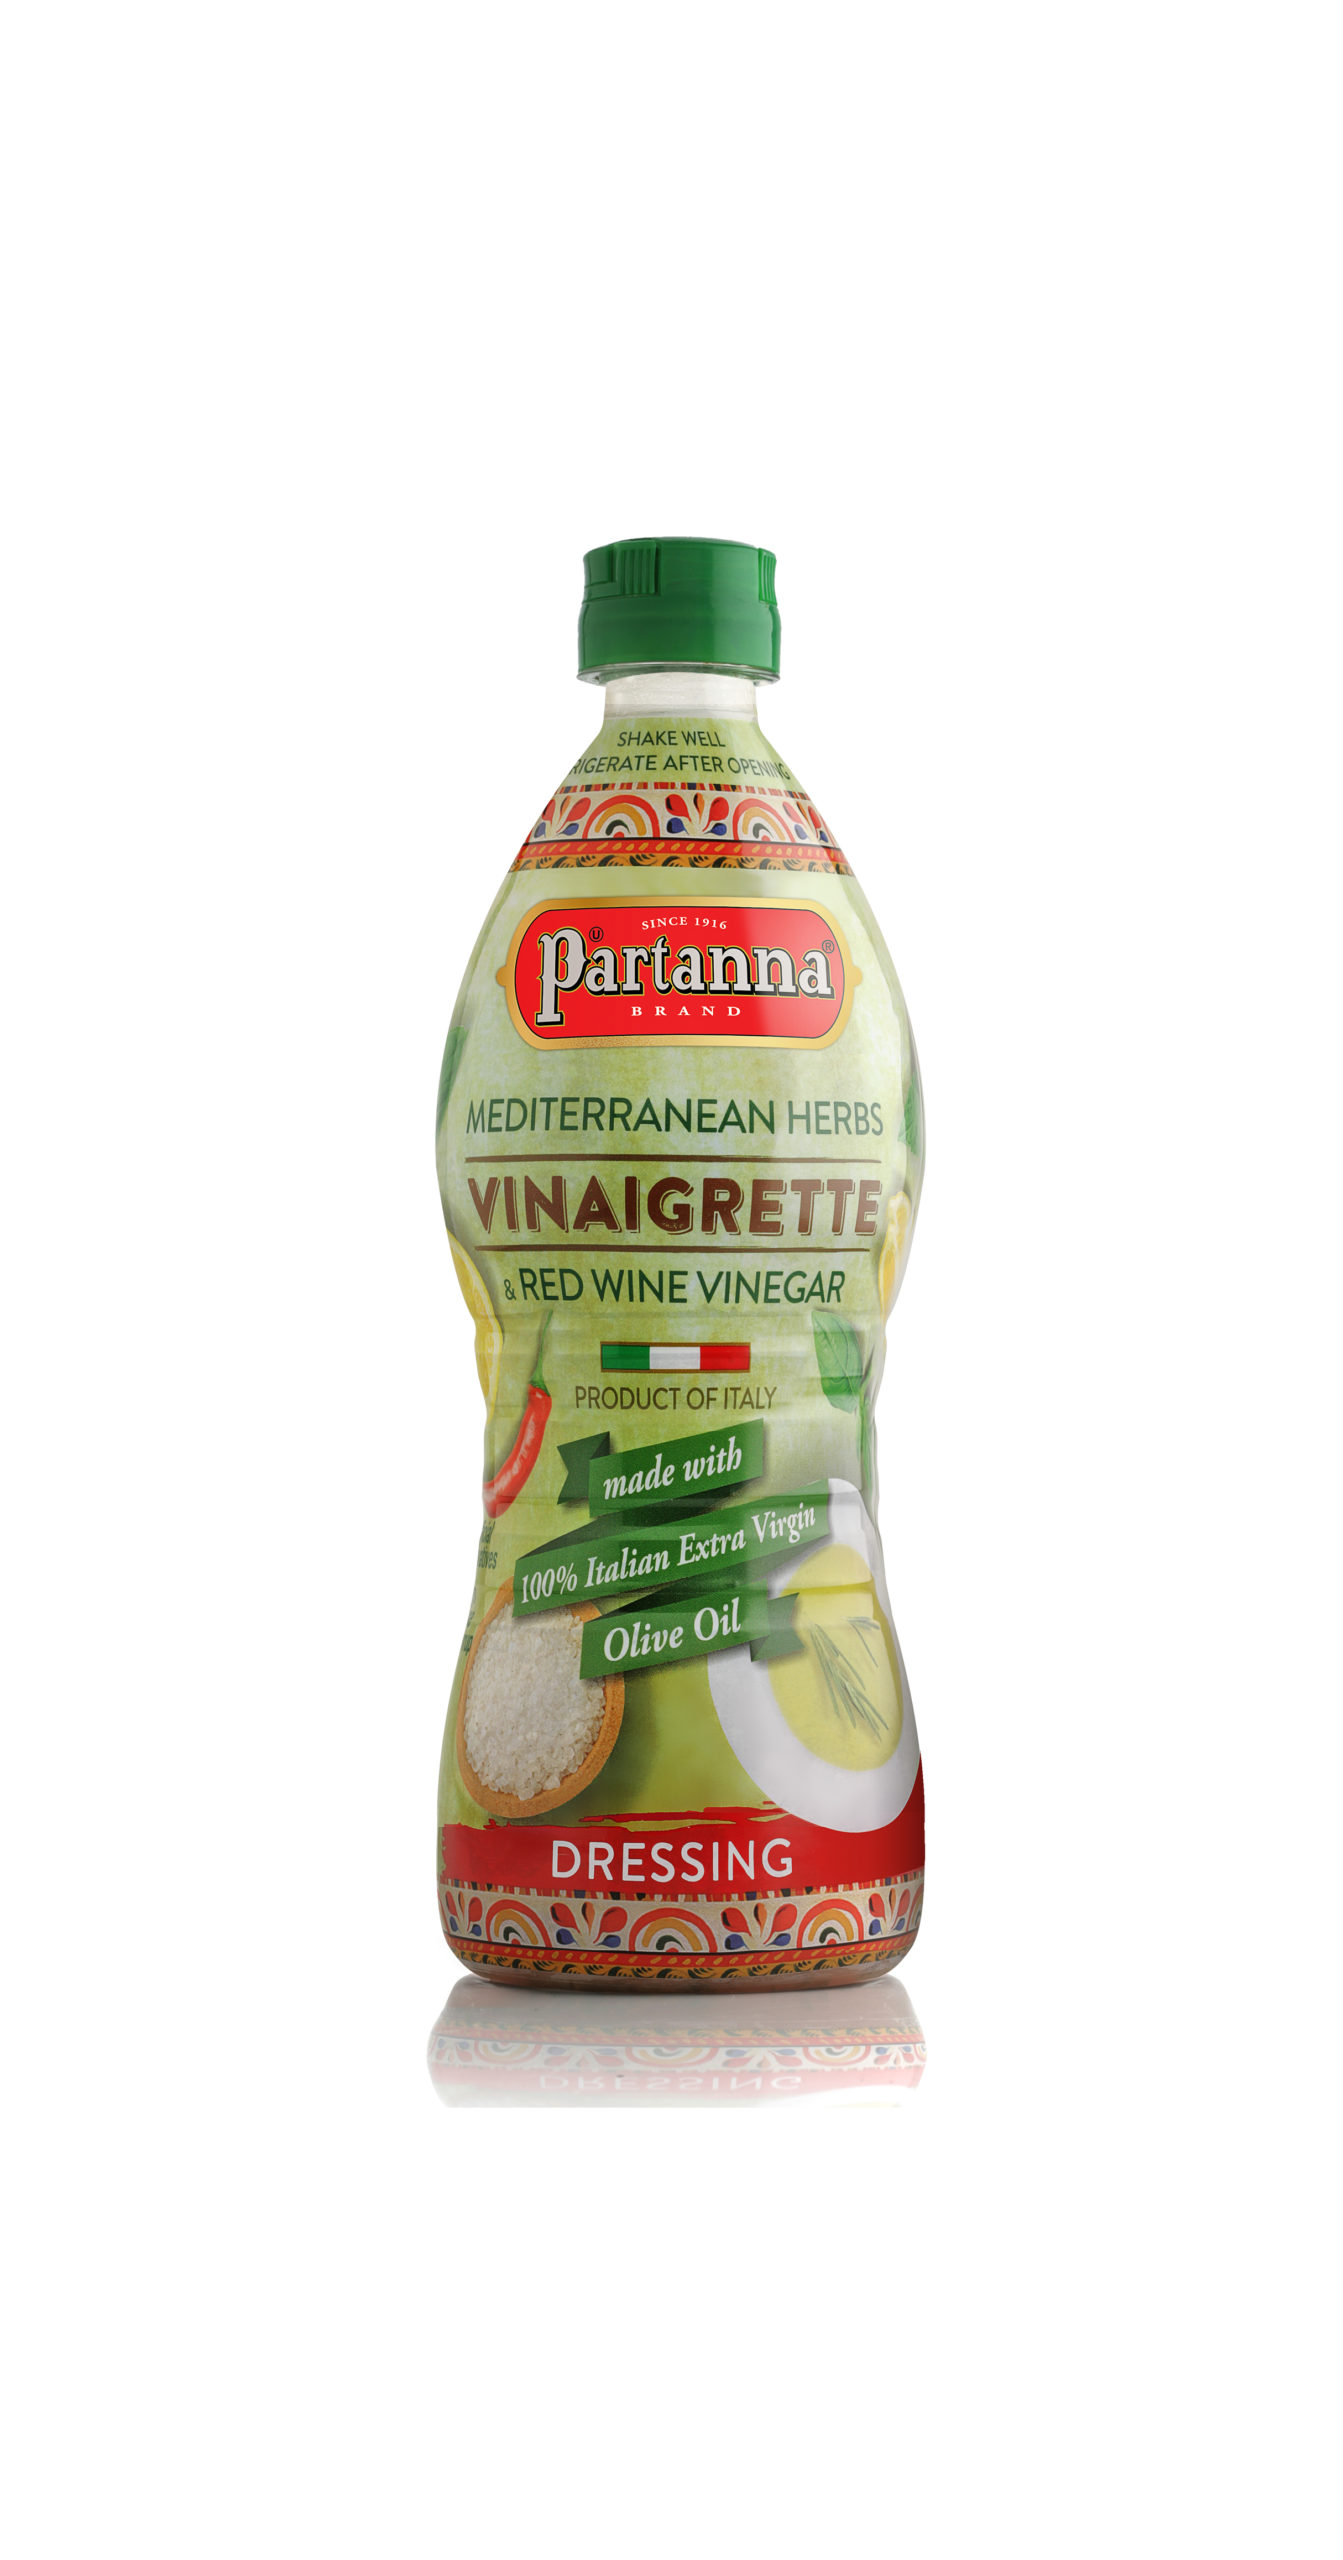 Partanna Mediterranean Herbs Vinaigrette